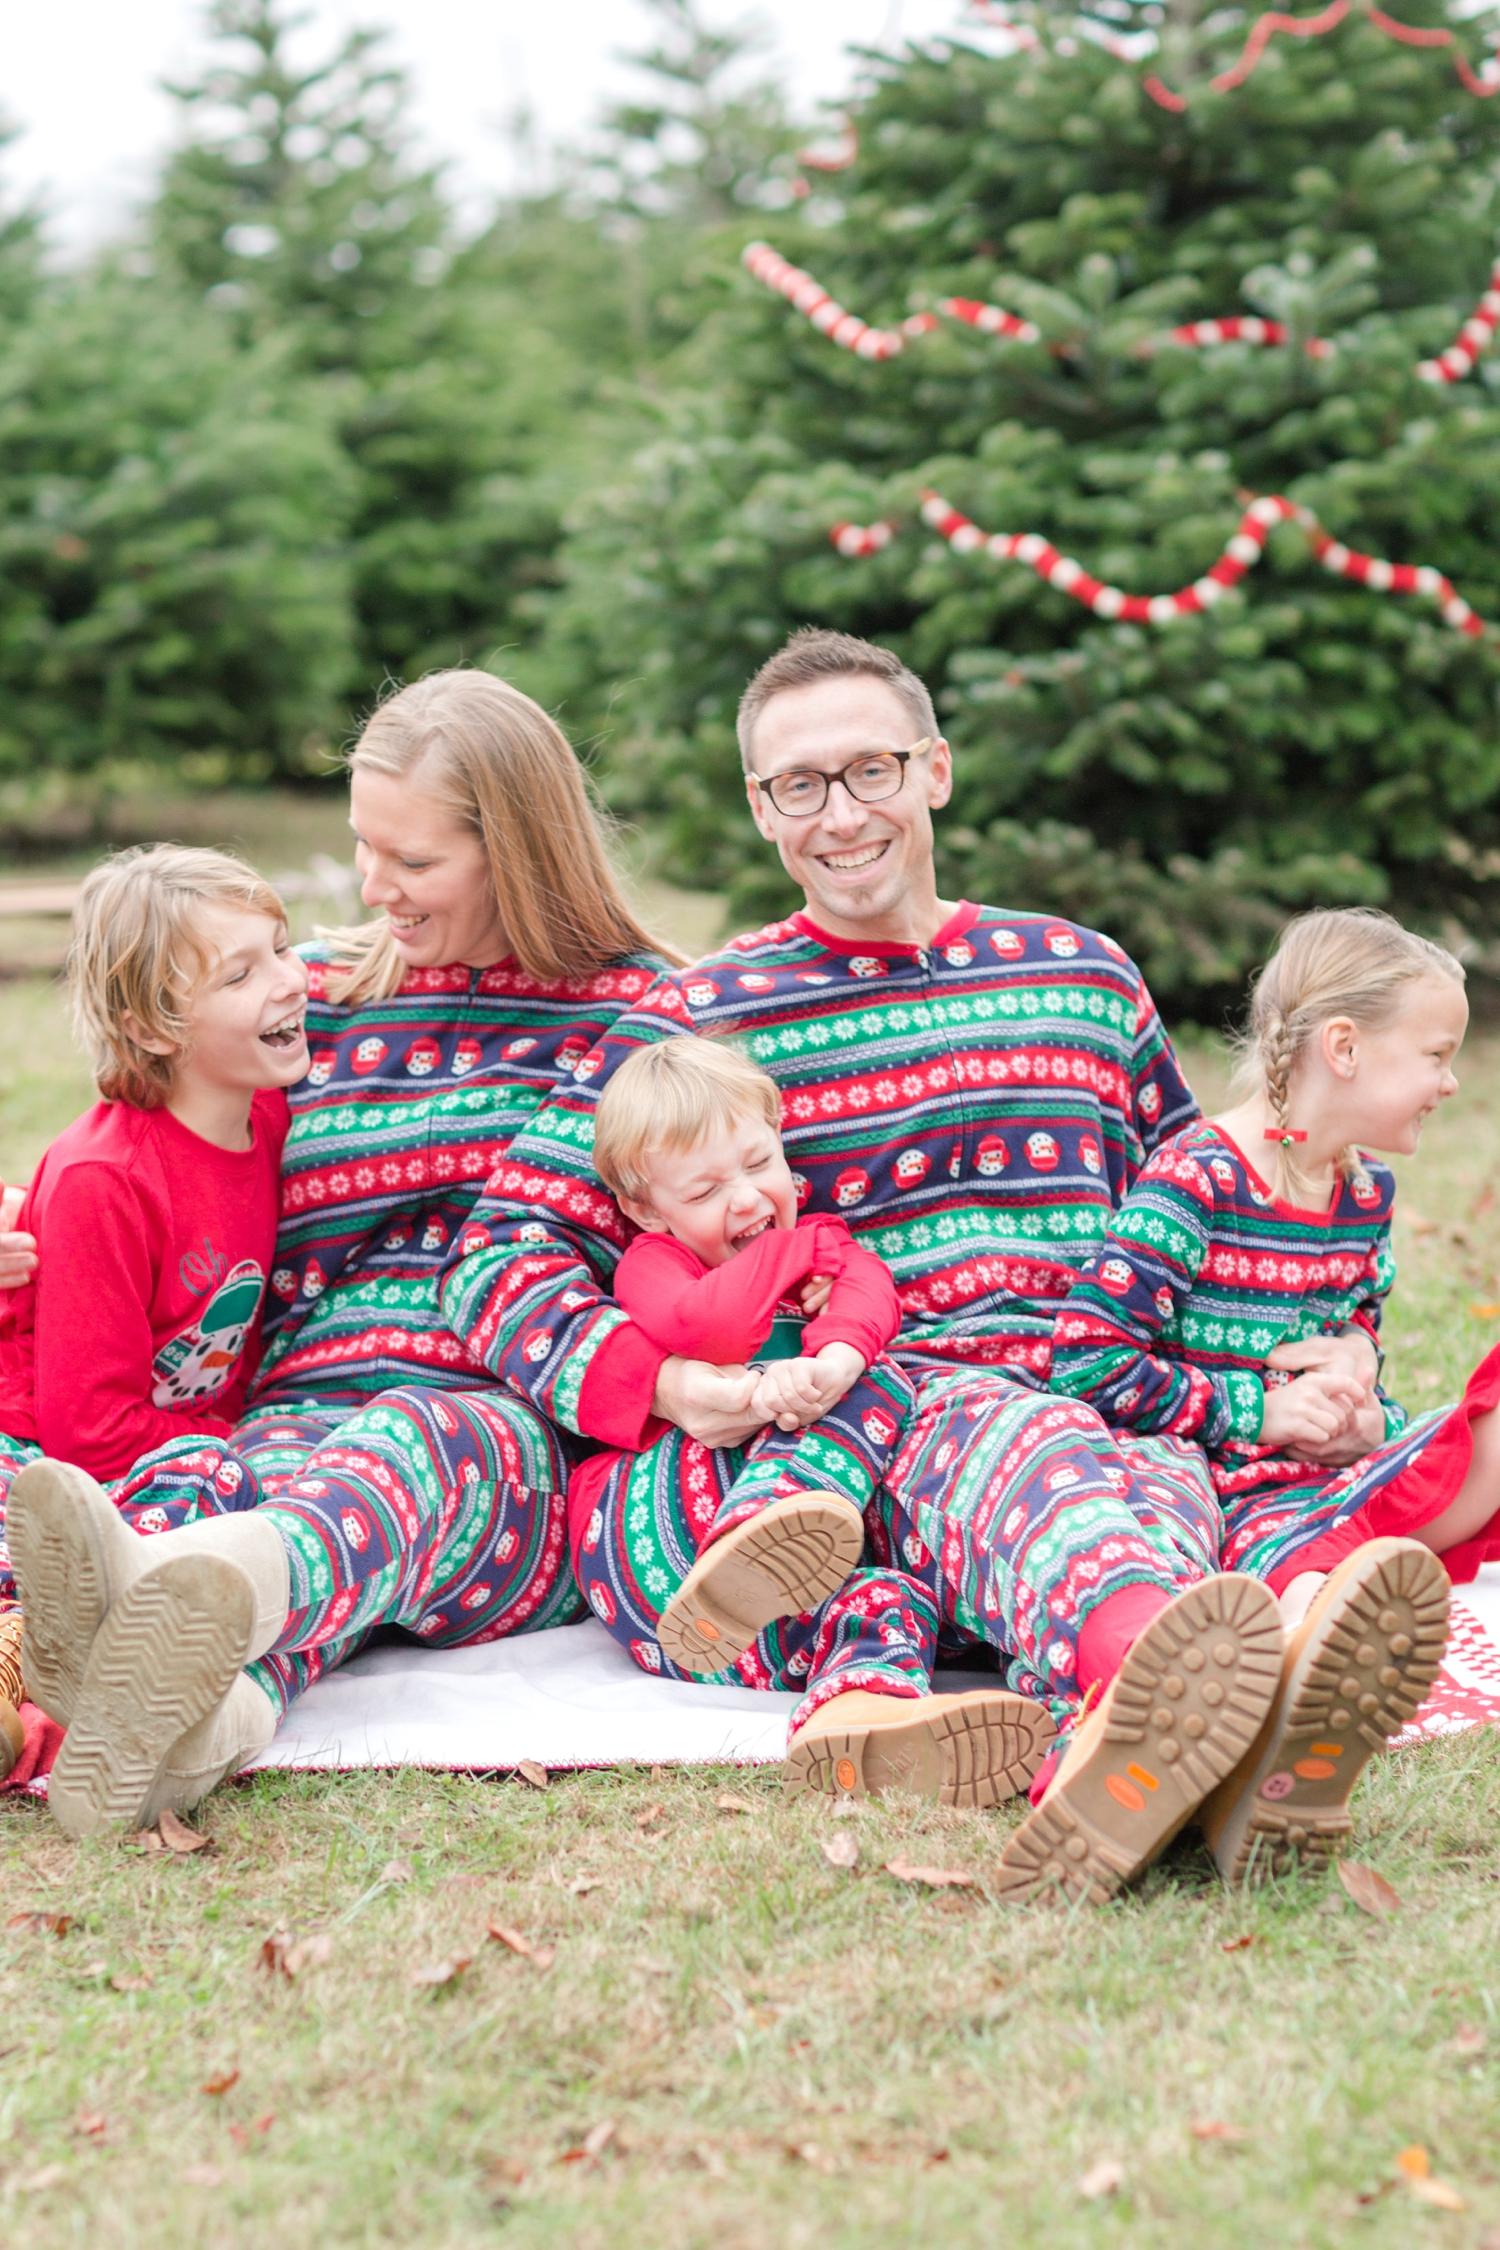 Golembiesky Family 2017-151_ruhl-tree-farm-baltimore-maryland-family-photography-anna-grace-photography-photo.jpg